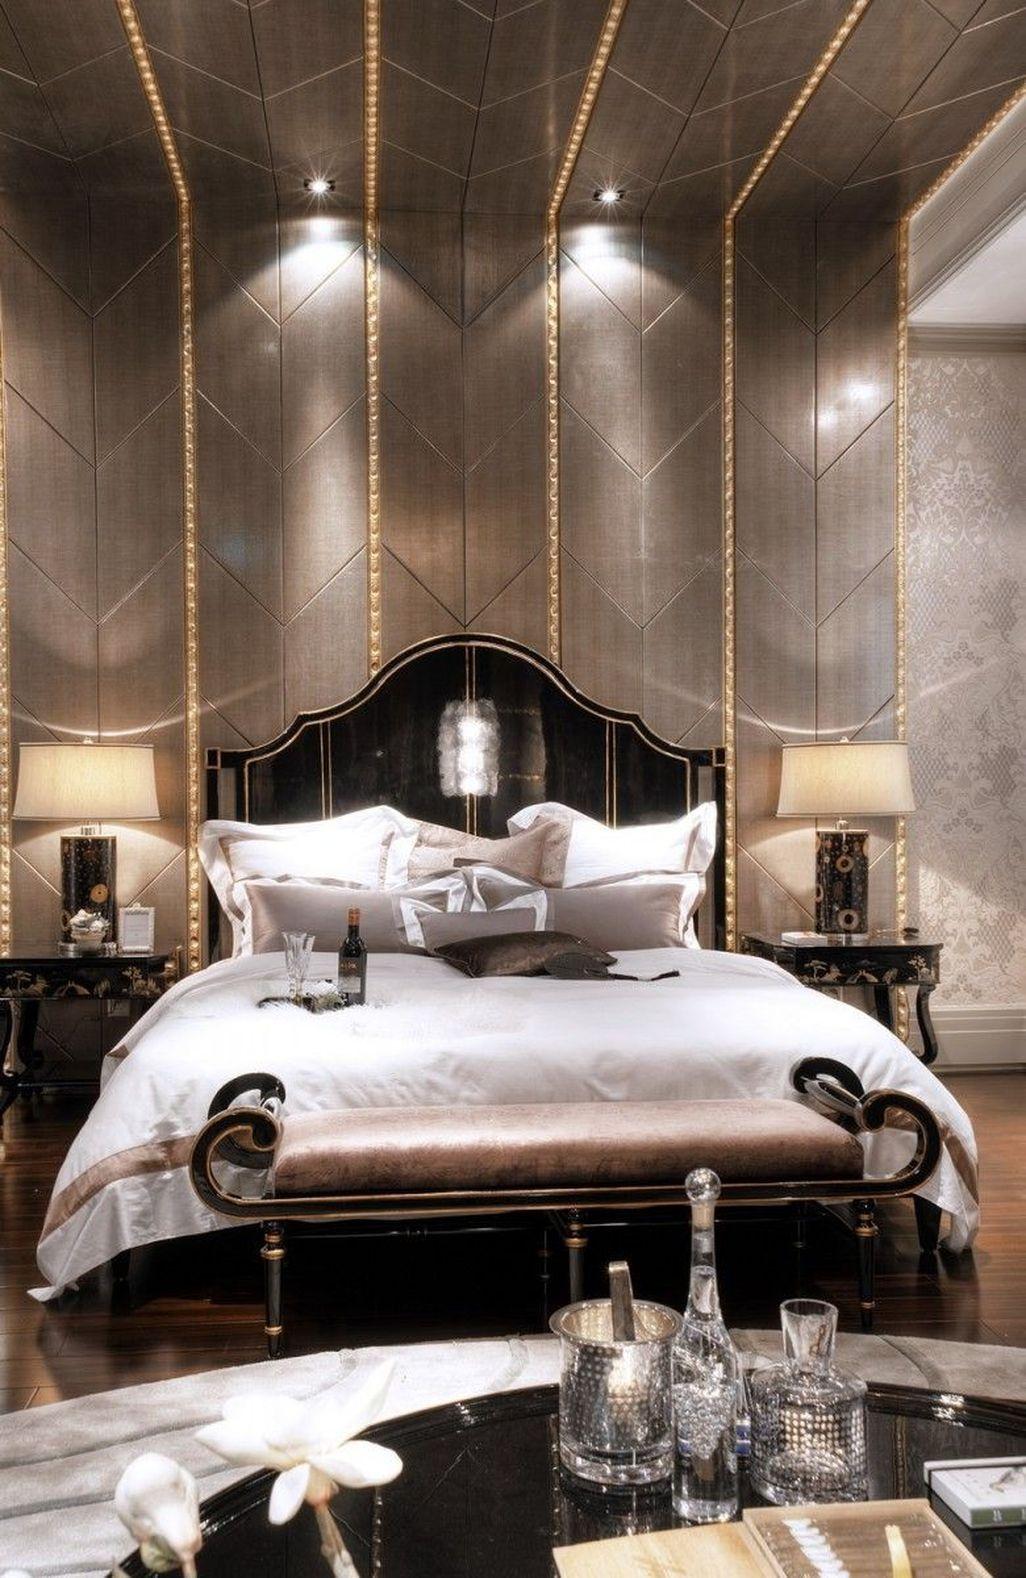 Wohndesign für 3 schlafzimmer nice  modern and luxury bedroom decor ideas more at